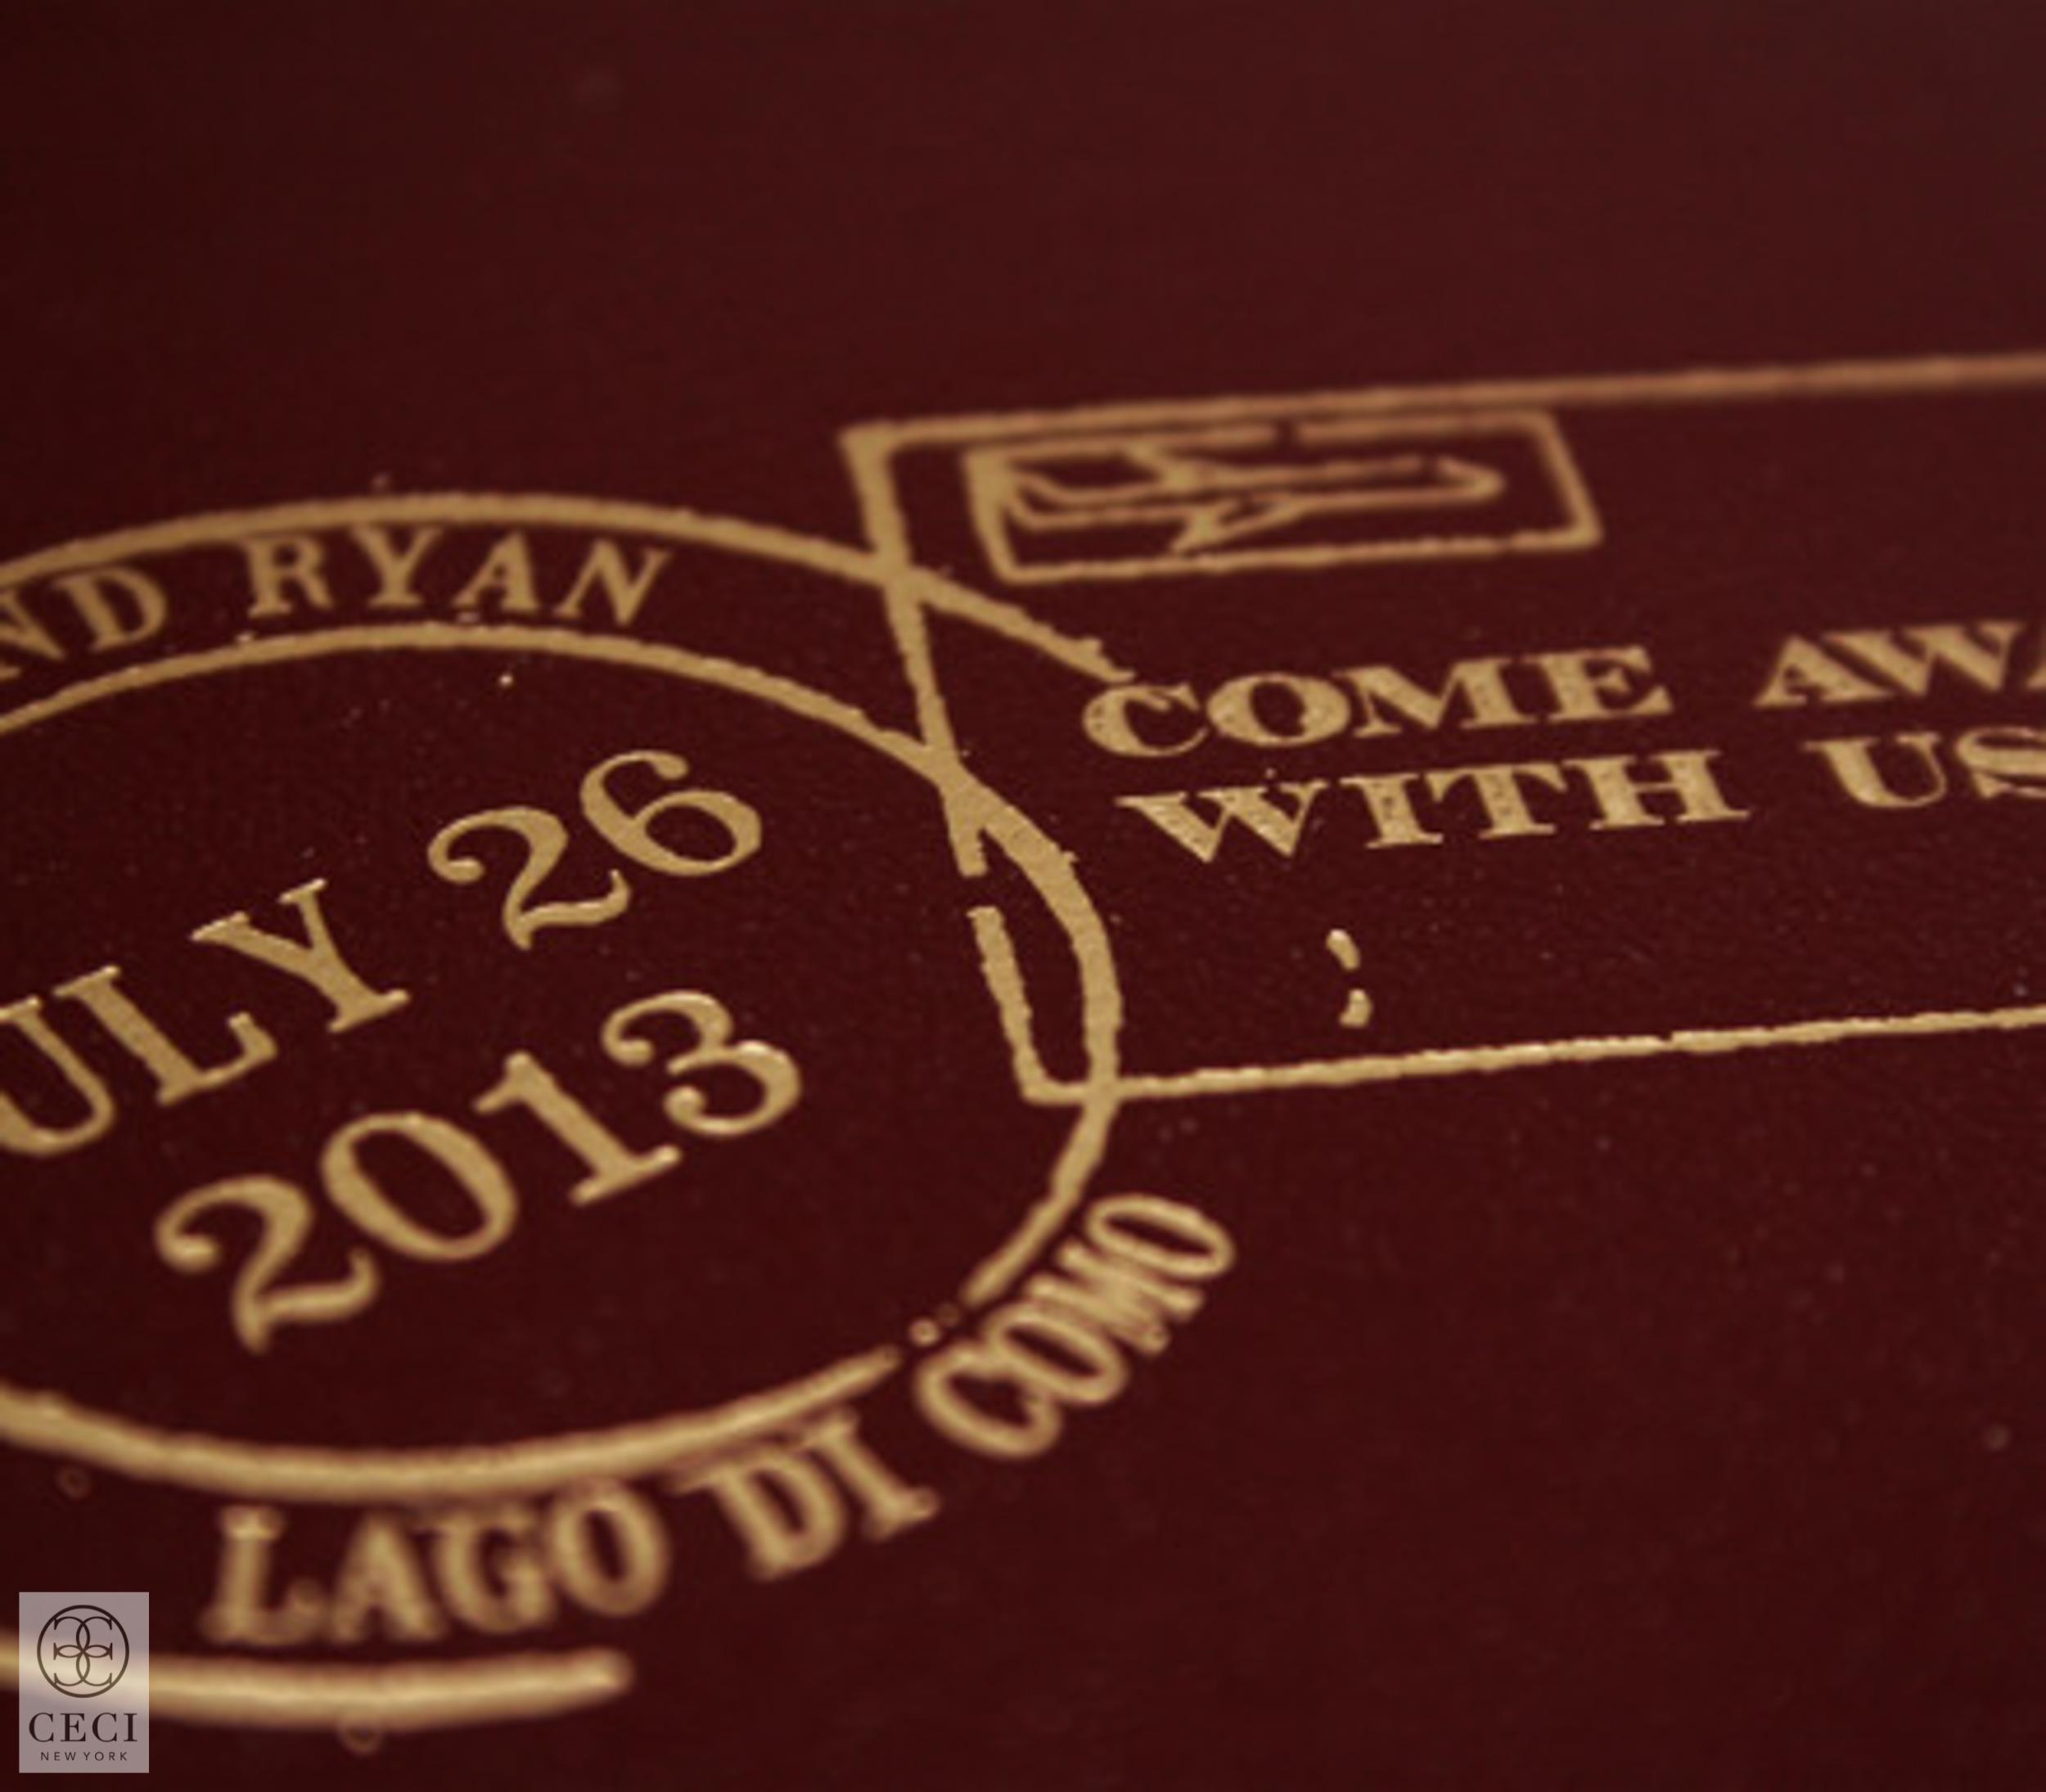 Ceci_New_York_Wedding_Lake_Como_Italy_Luxury_Style_Custom_Invitation-11.jpg